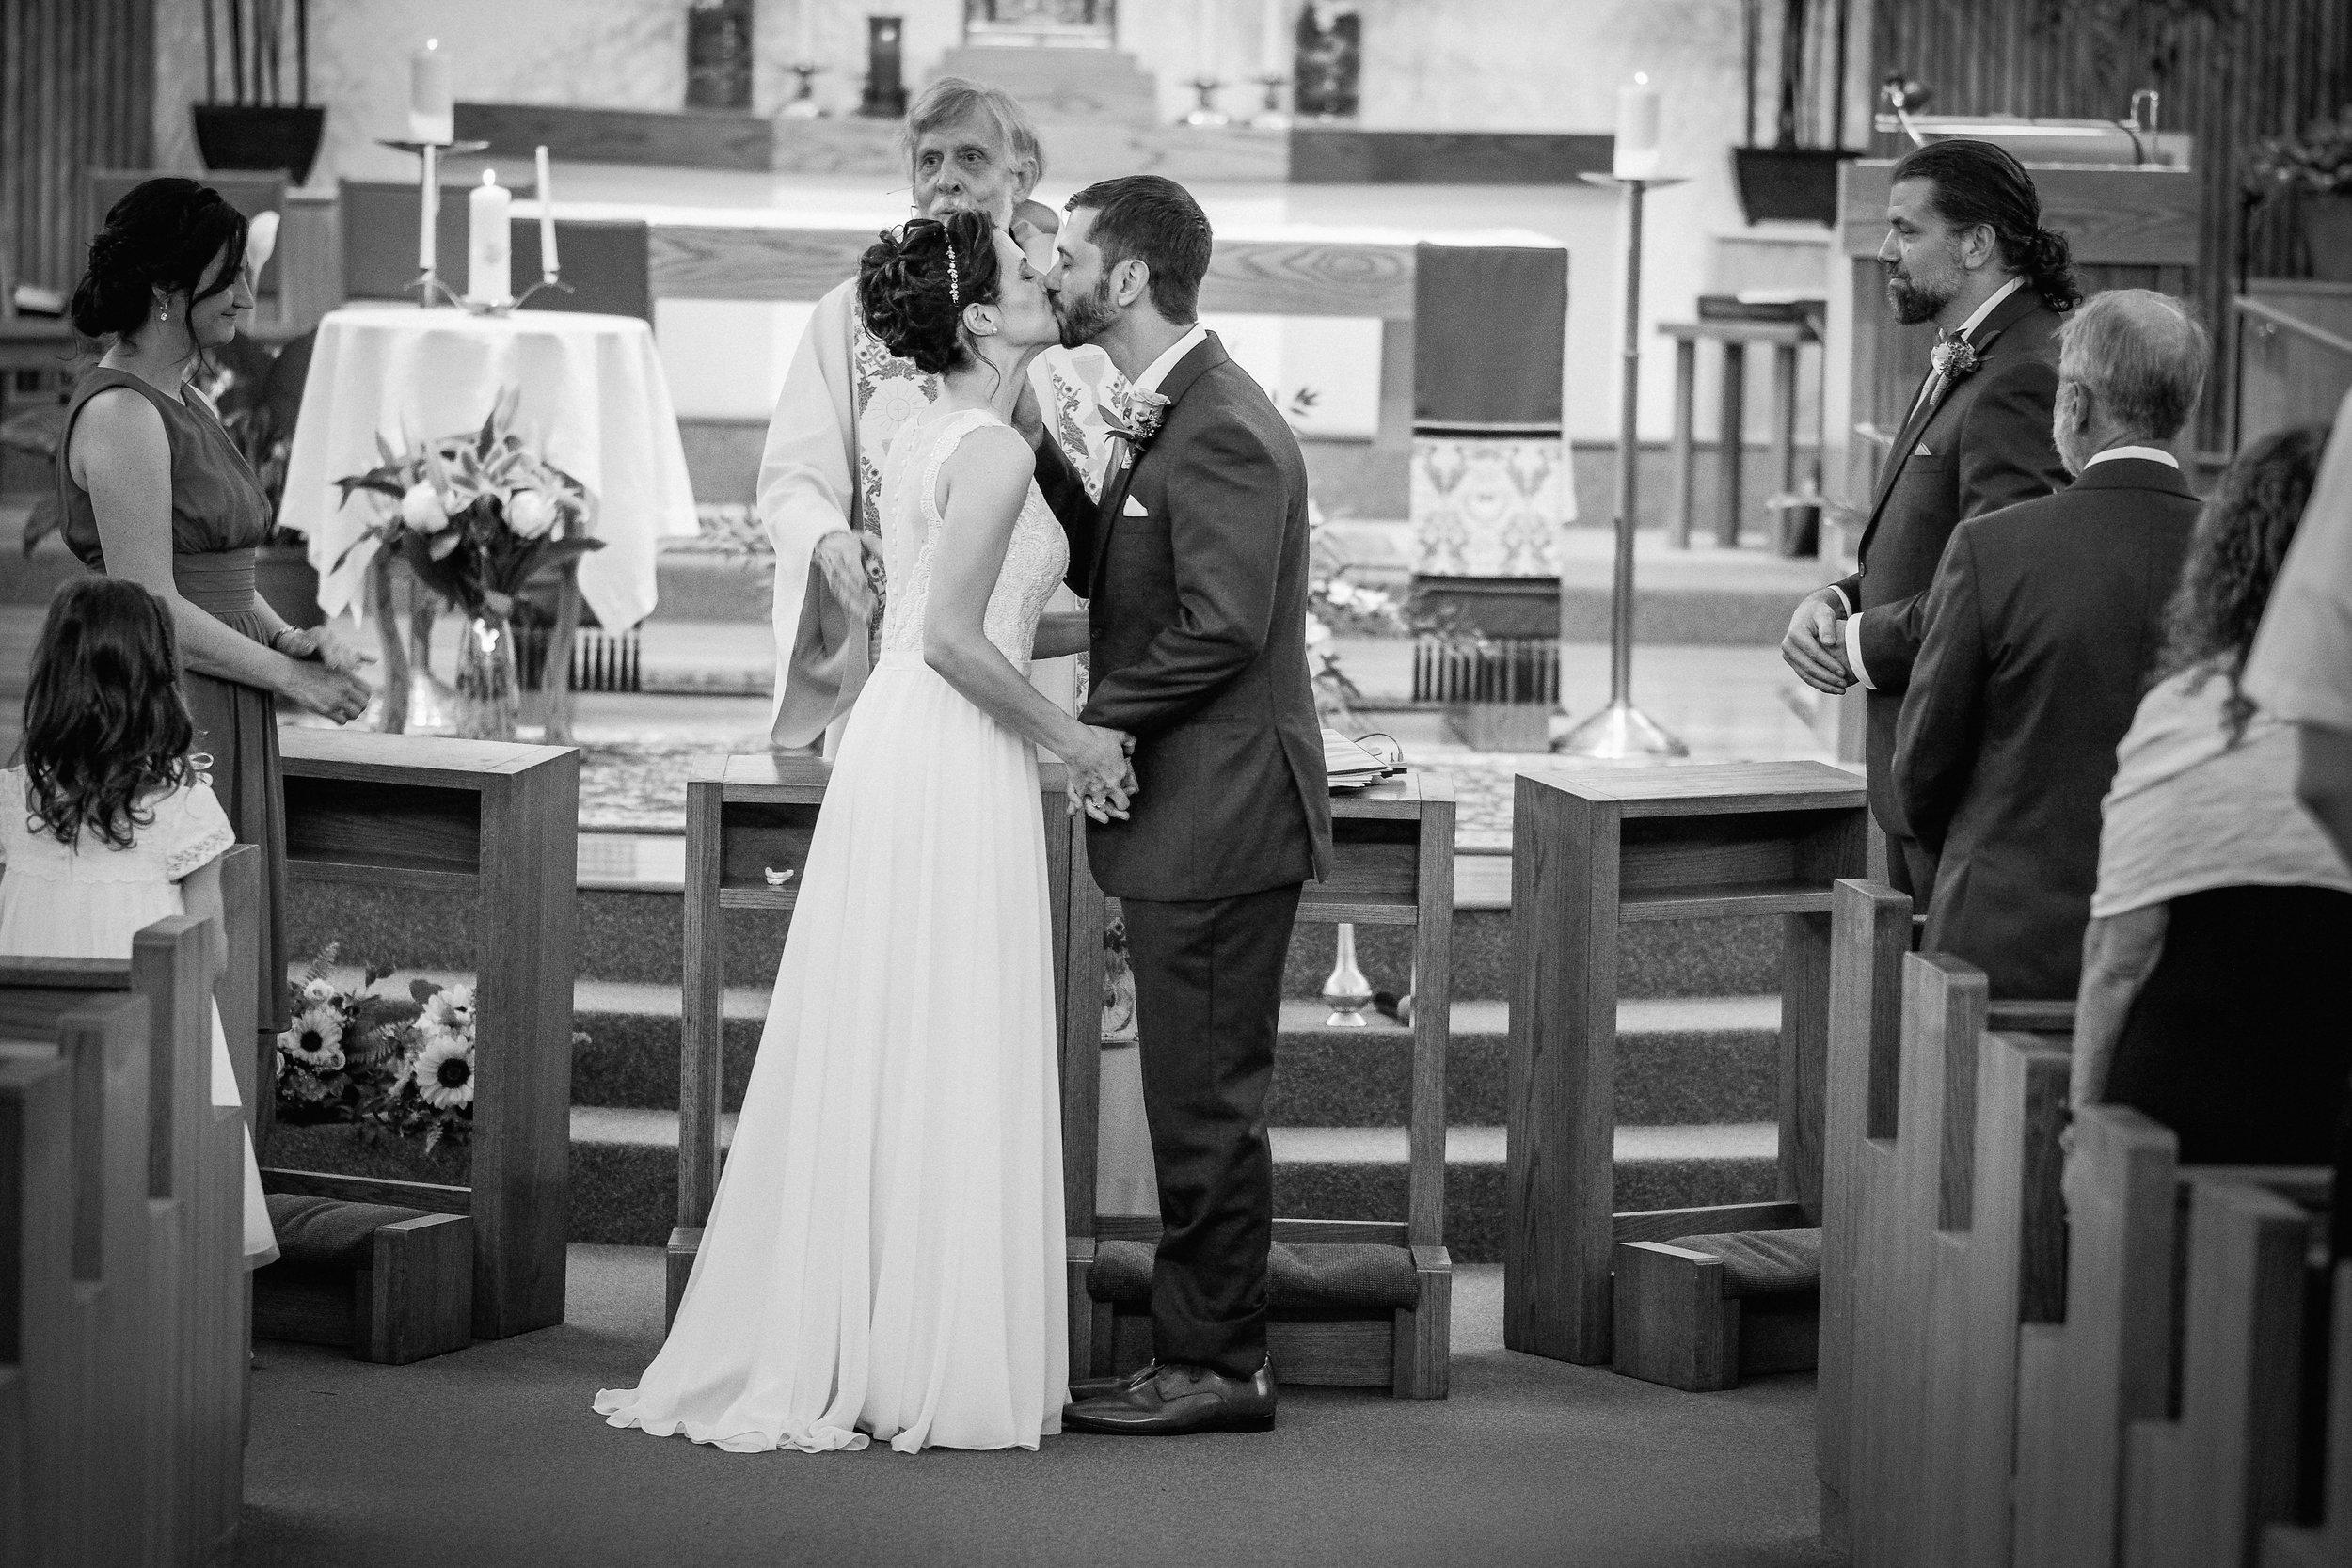 Peabody-Smith-Barn-Wedding-Photography-13.jpg